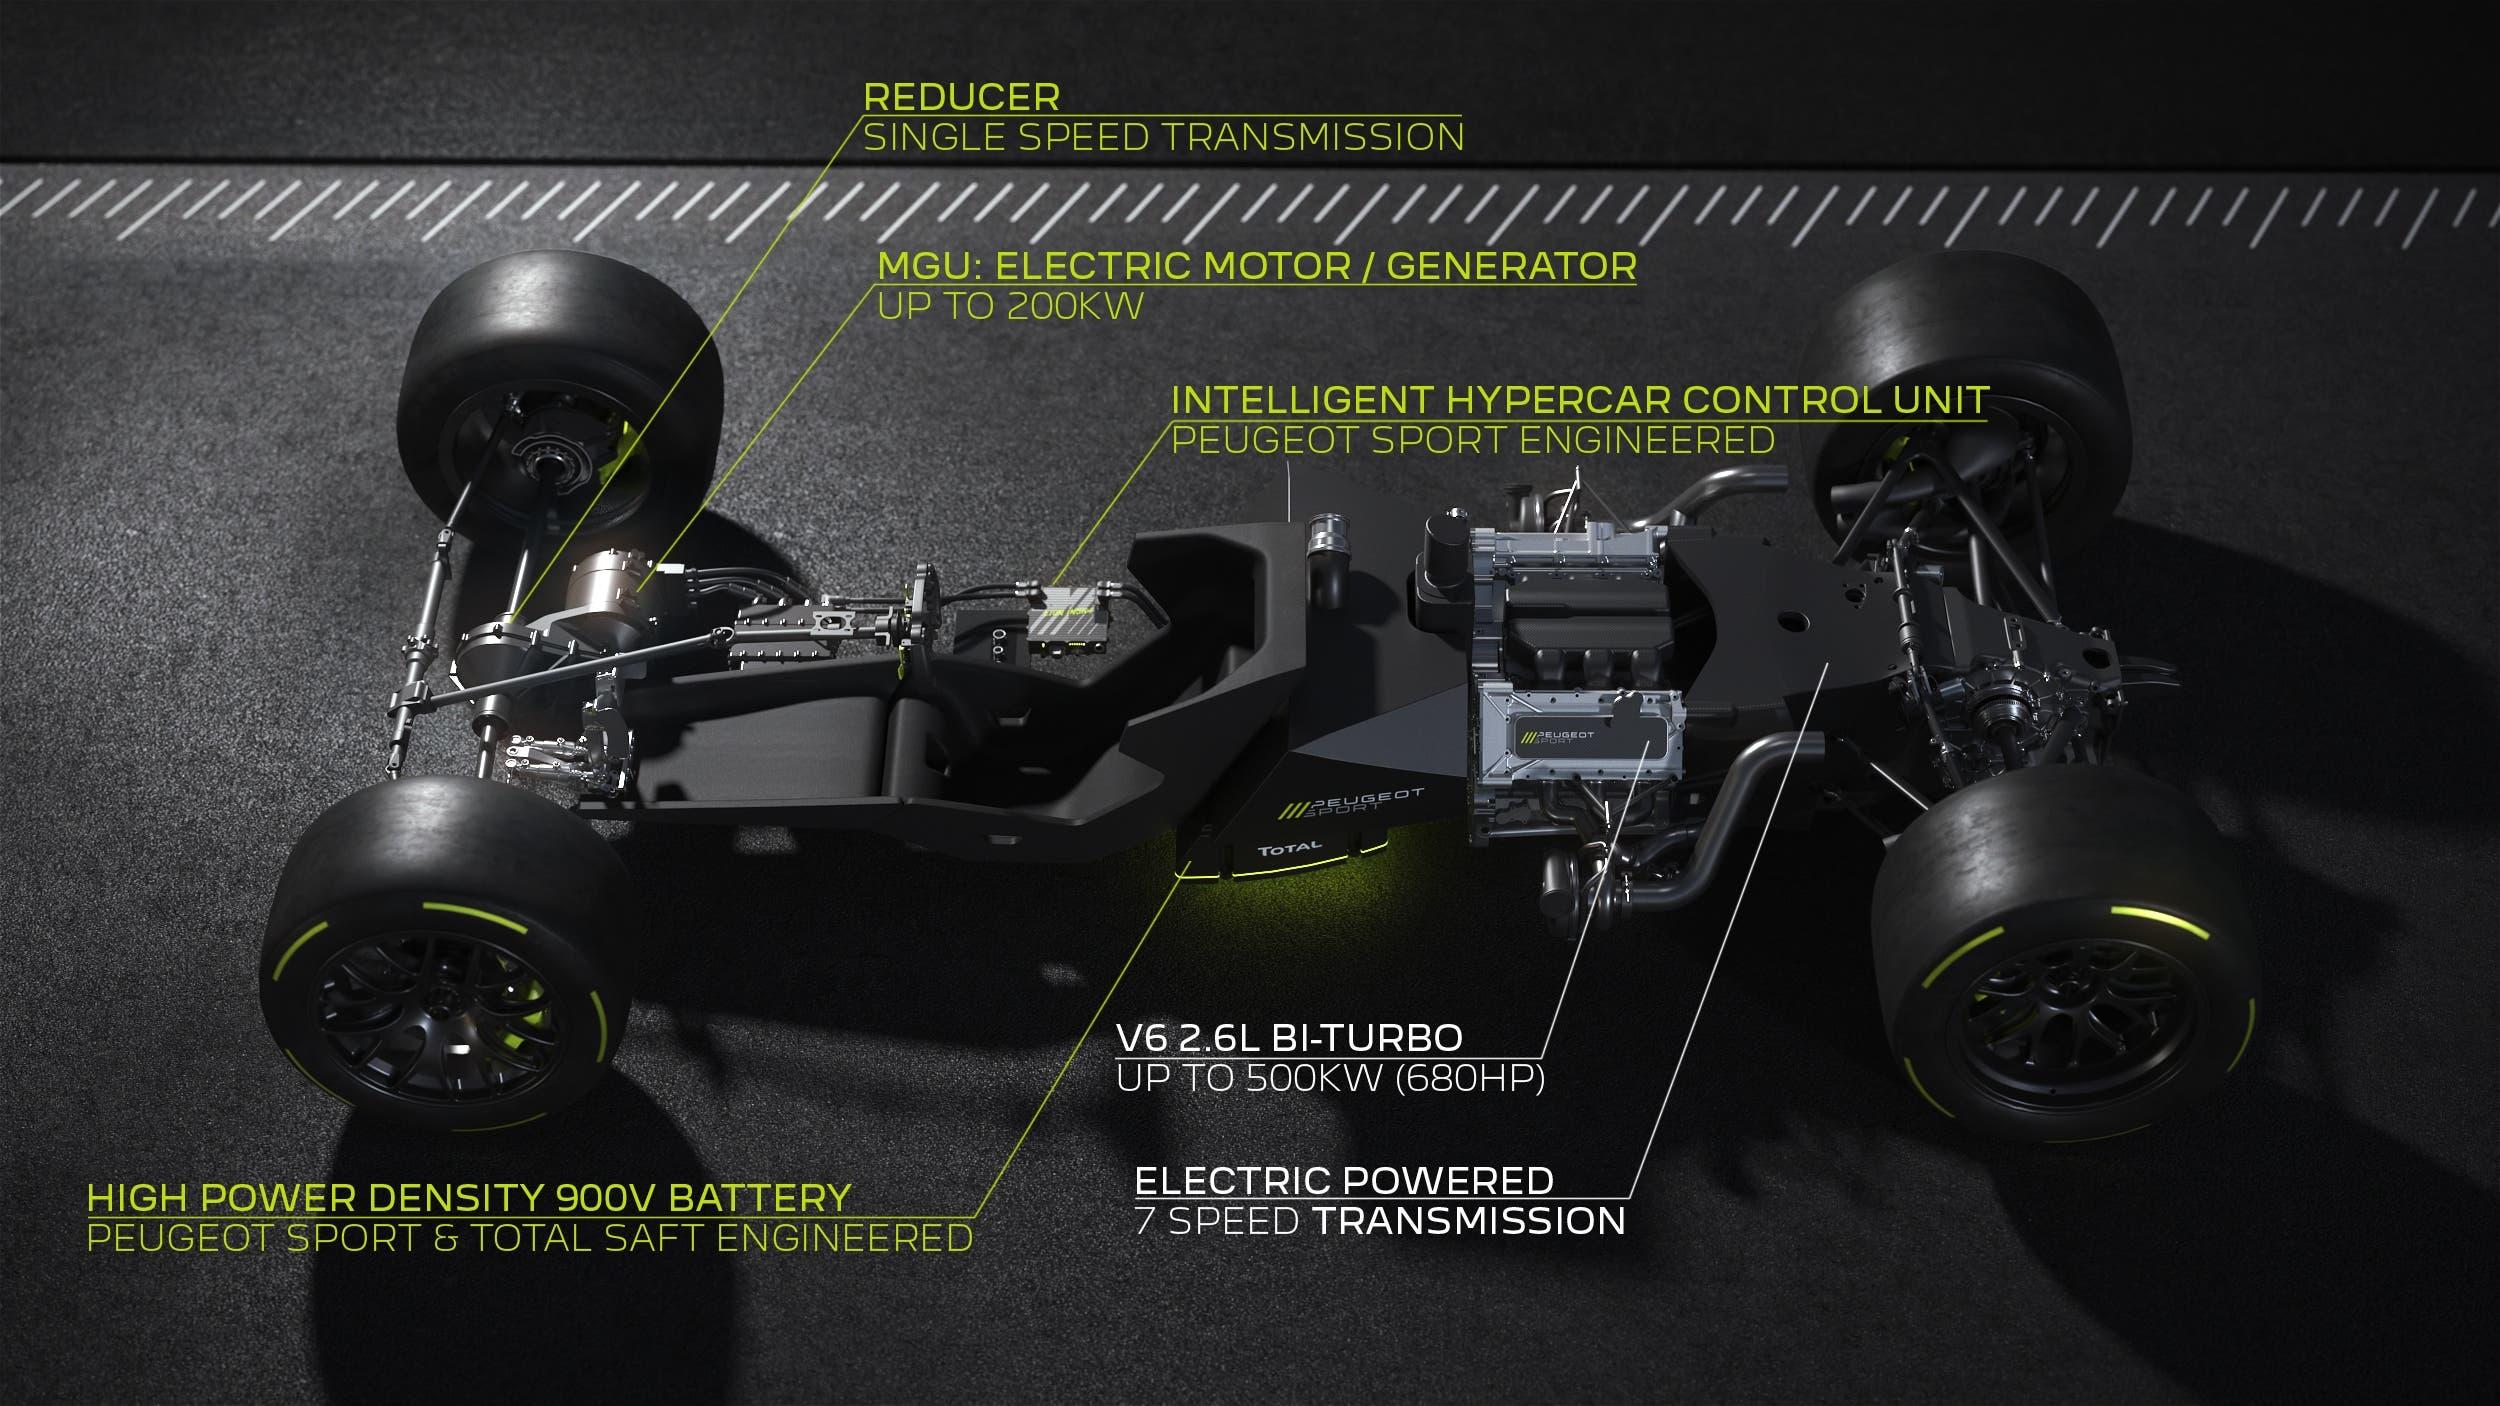 Peugeot Hybrid4 500 kW hypercar LMH